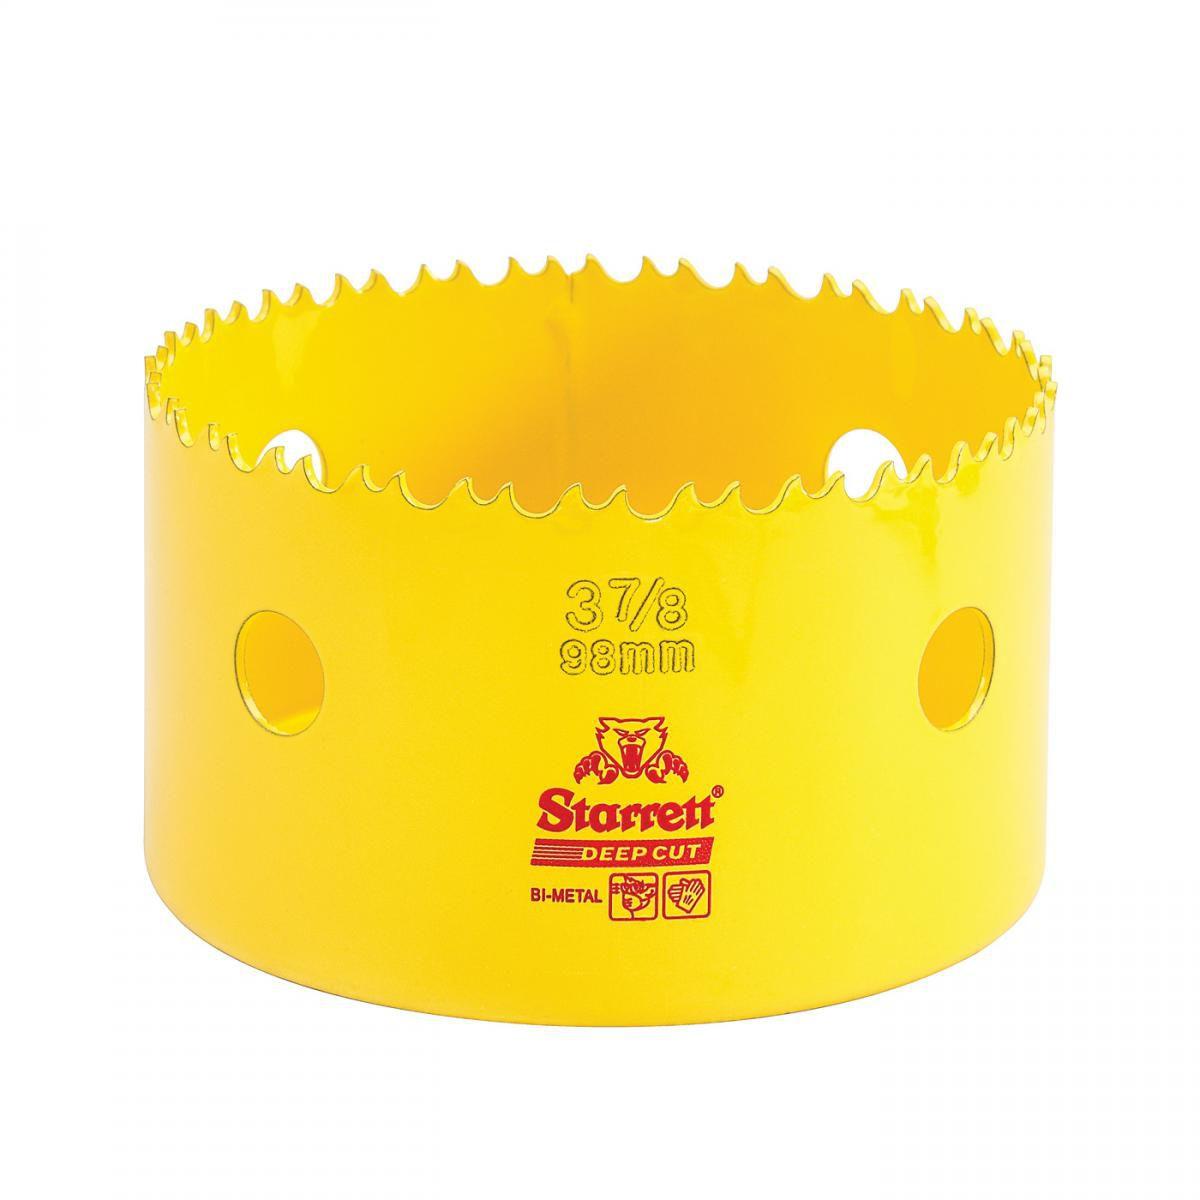 Serra Copo Deep Cut 3.7/8'' (98mm) Starrett – DCH0378-G